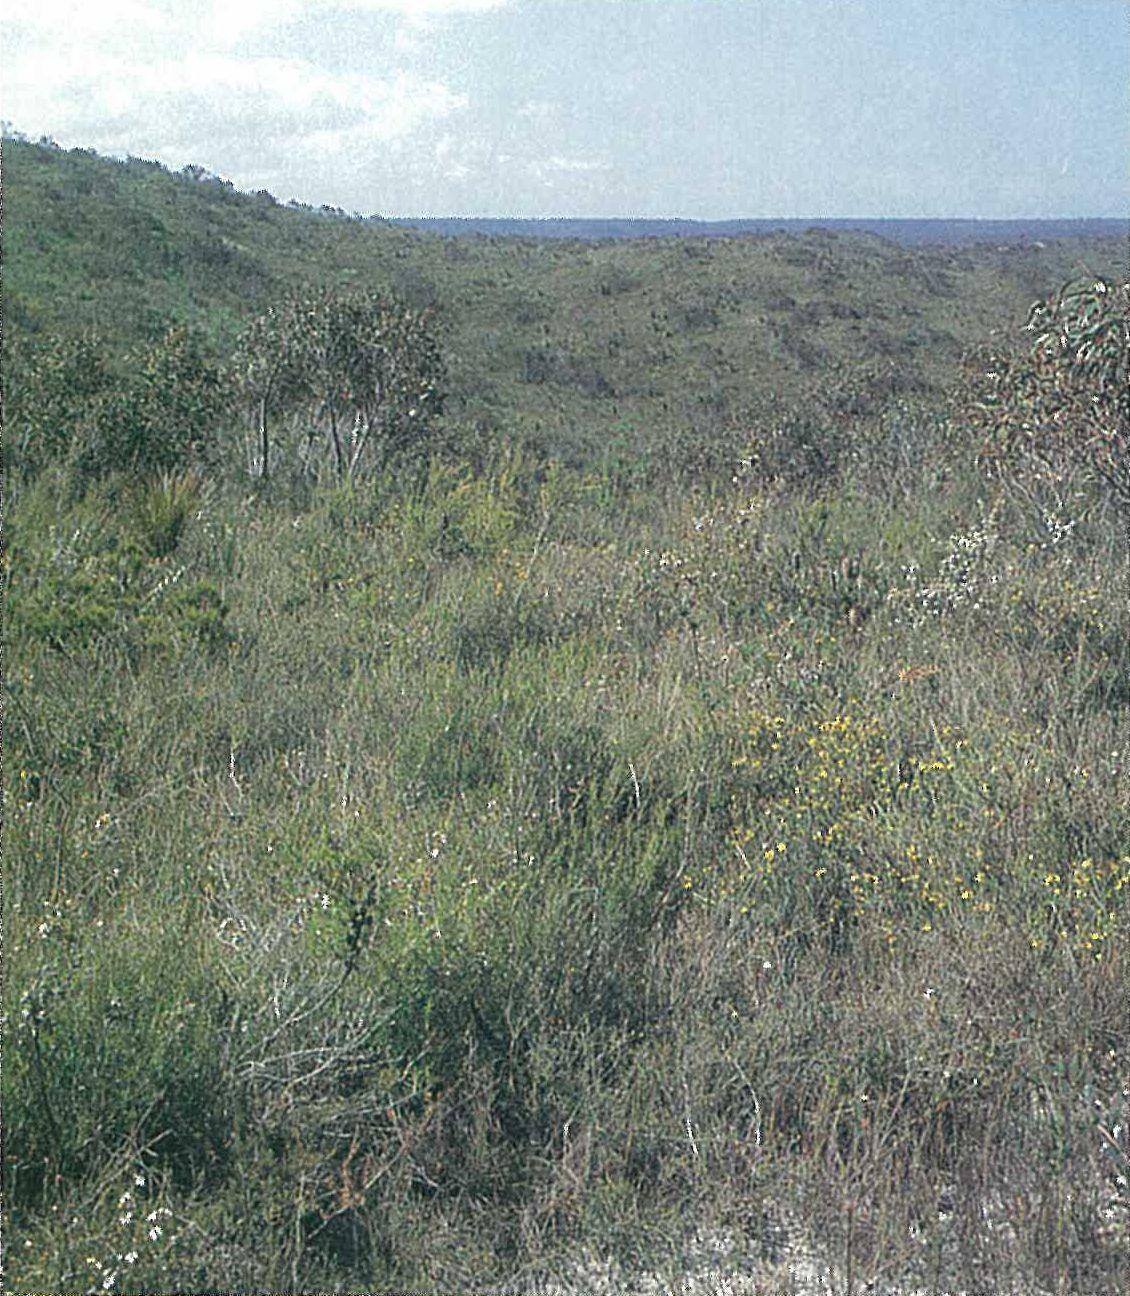 Otway Plain; Leptospermum mysinoides heathland. Shrub-layer of Allocasuarina misera, Aotus myricoides, Banksia marginata, Leptospermum continentale and L. myrsinoides. Eucalyptus willisii an occasional emergent. Xanthorrhoea australis in background. Bald Hills, Anglesea.